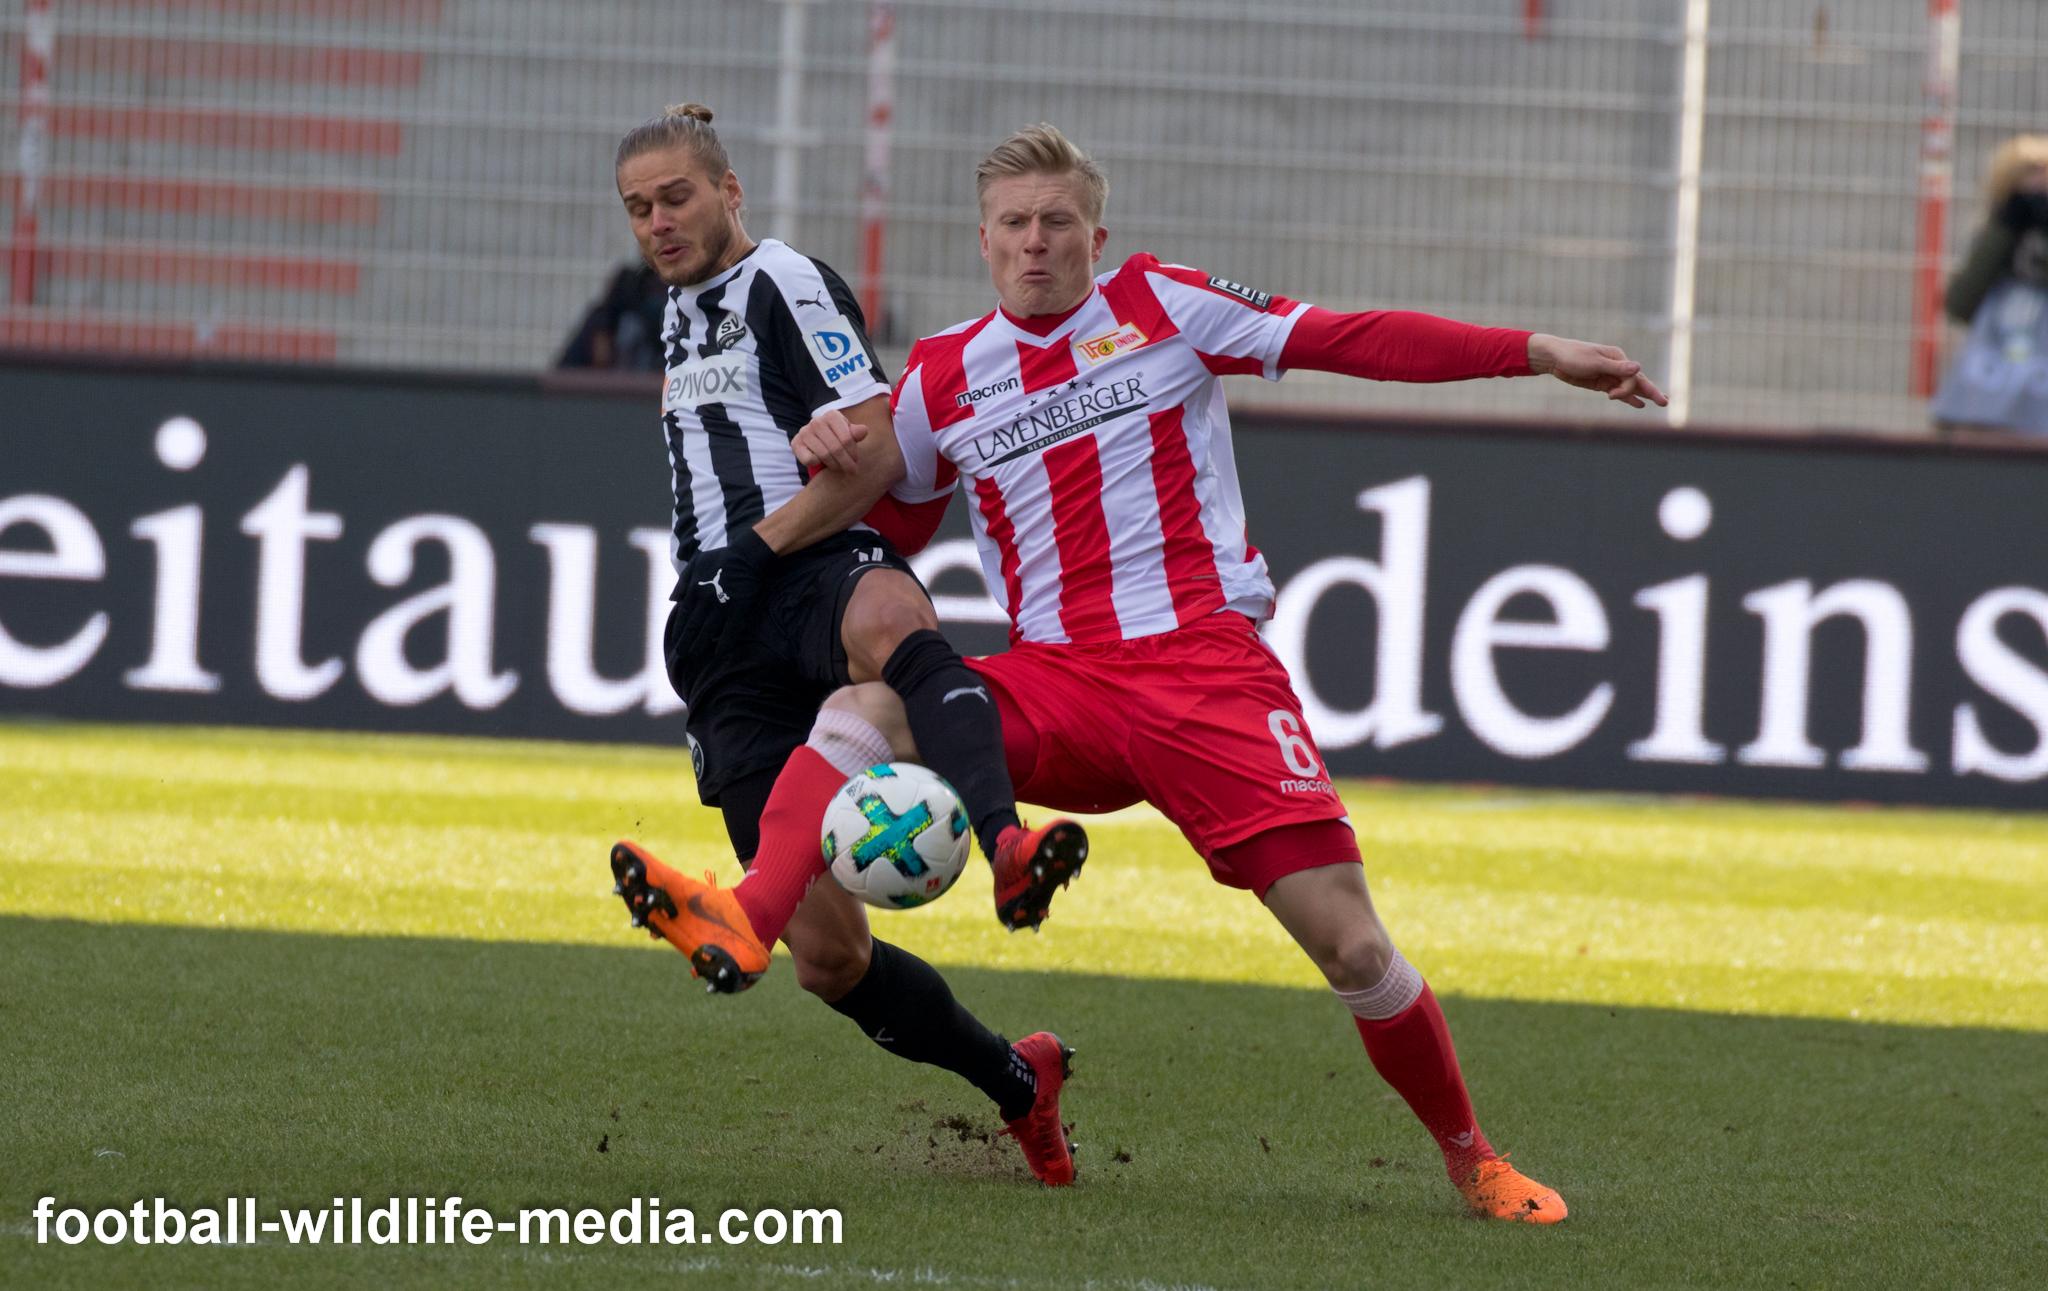 Kristian Pedersen fights for the ball